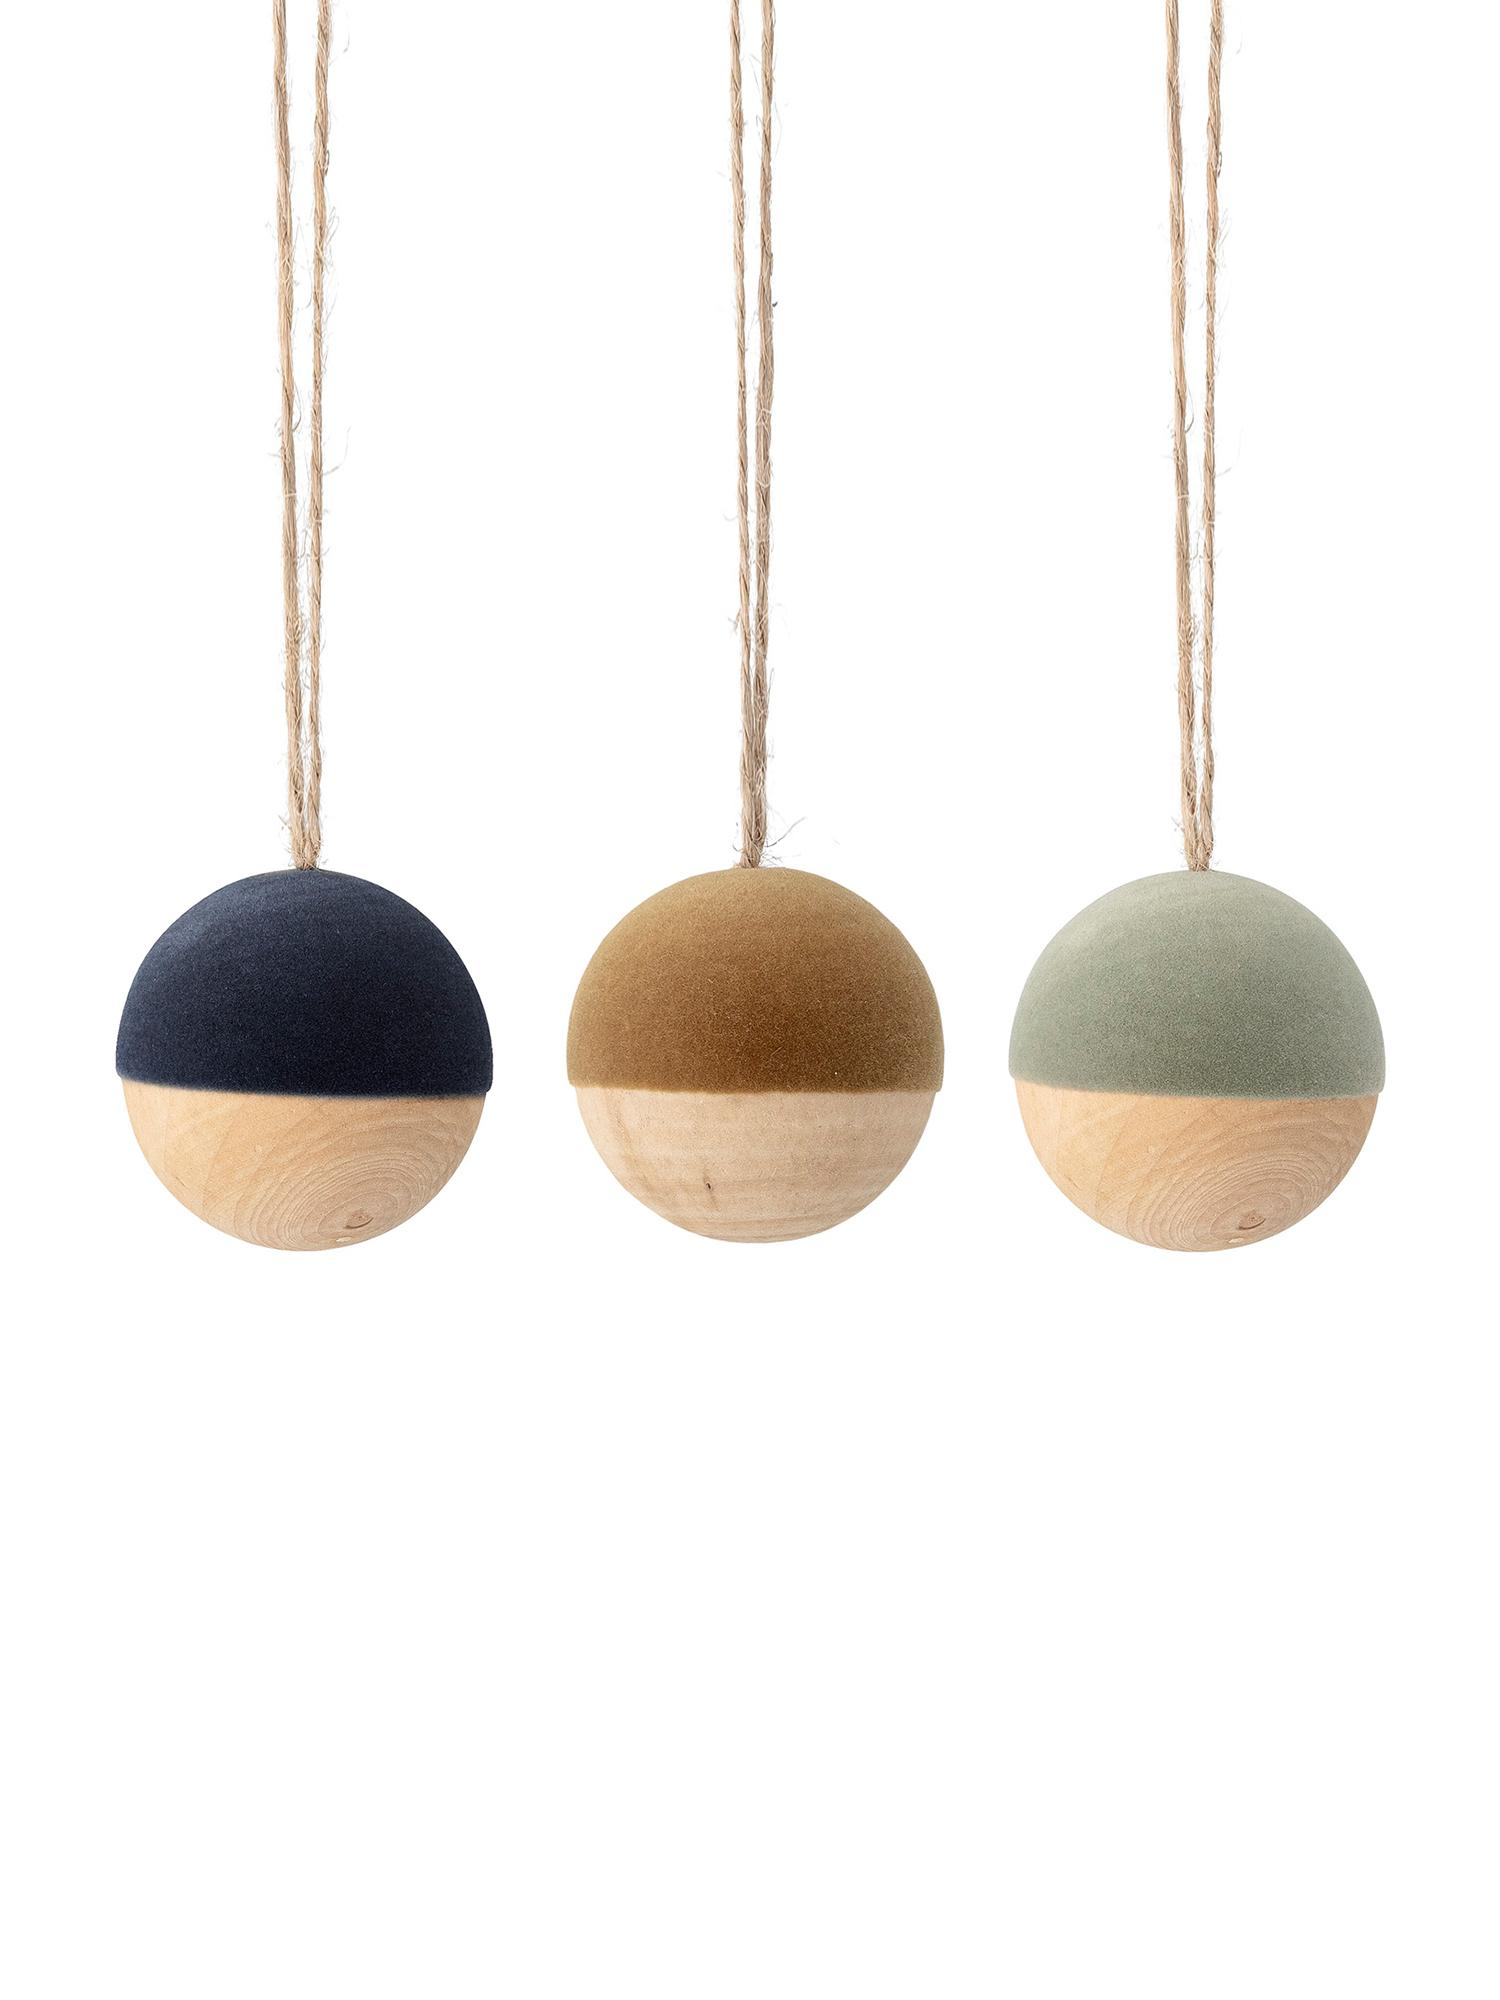 Set de bolas de Navidad de terciopelo Thace, 3pzas., Madera, terciopelo de poliéster, Azul oscuro, mostaza, verde menta, madera, Ø 5 cm